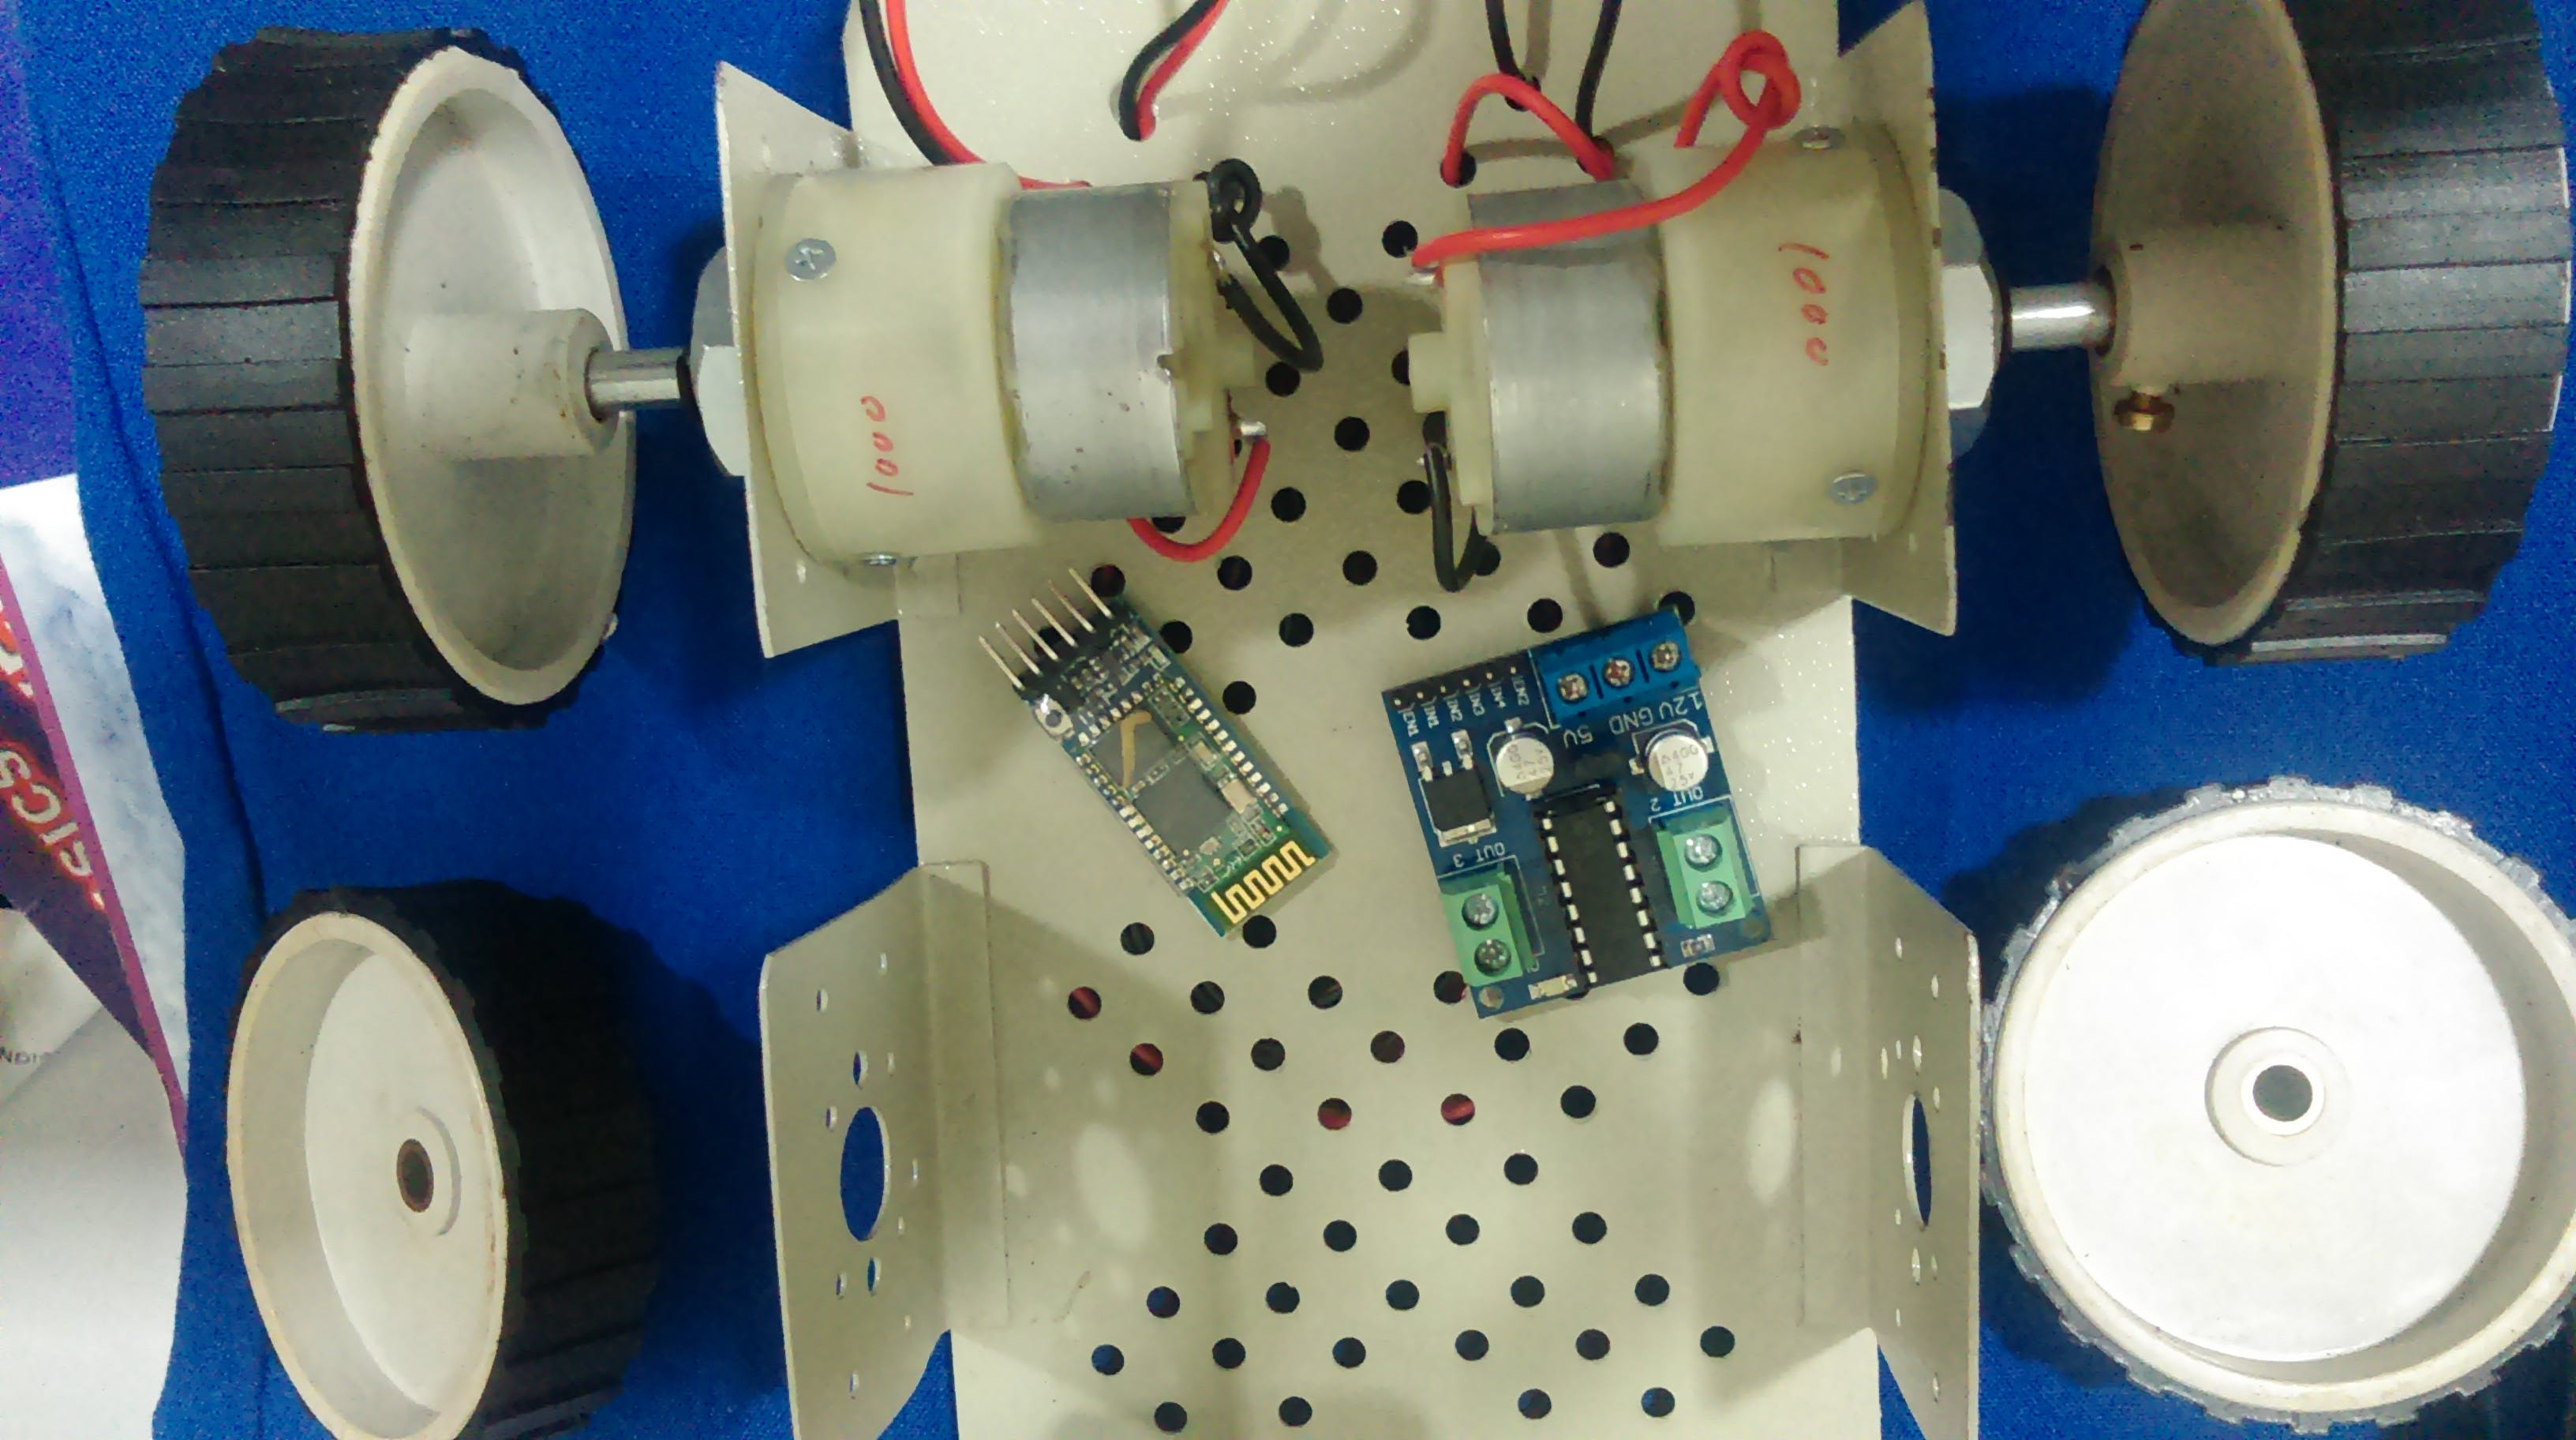 motordriver , dc motors, motor driver, bluetooth module, motor wheels , metallic chassis.